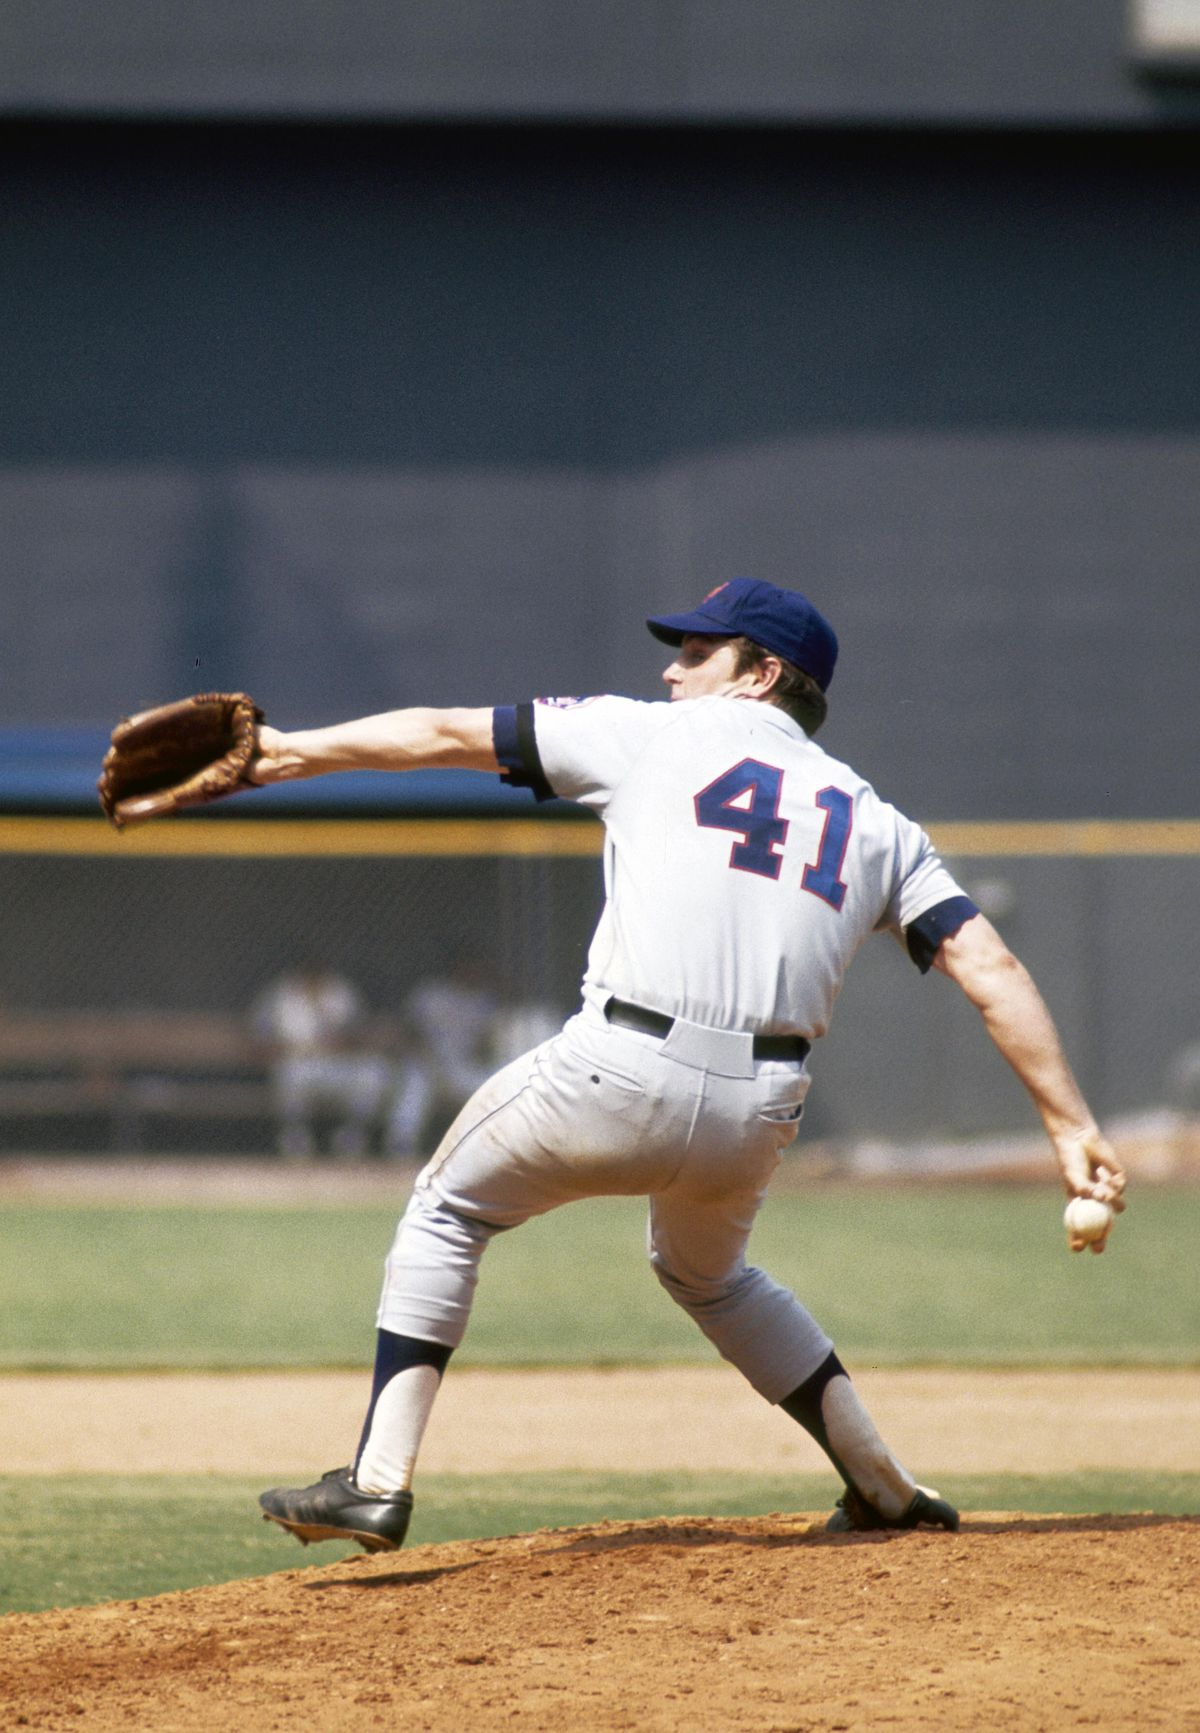 Tom Seaver (credit: Manny Rubio/USA TODAY Sports)